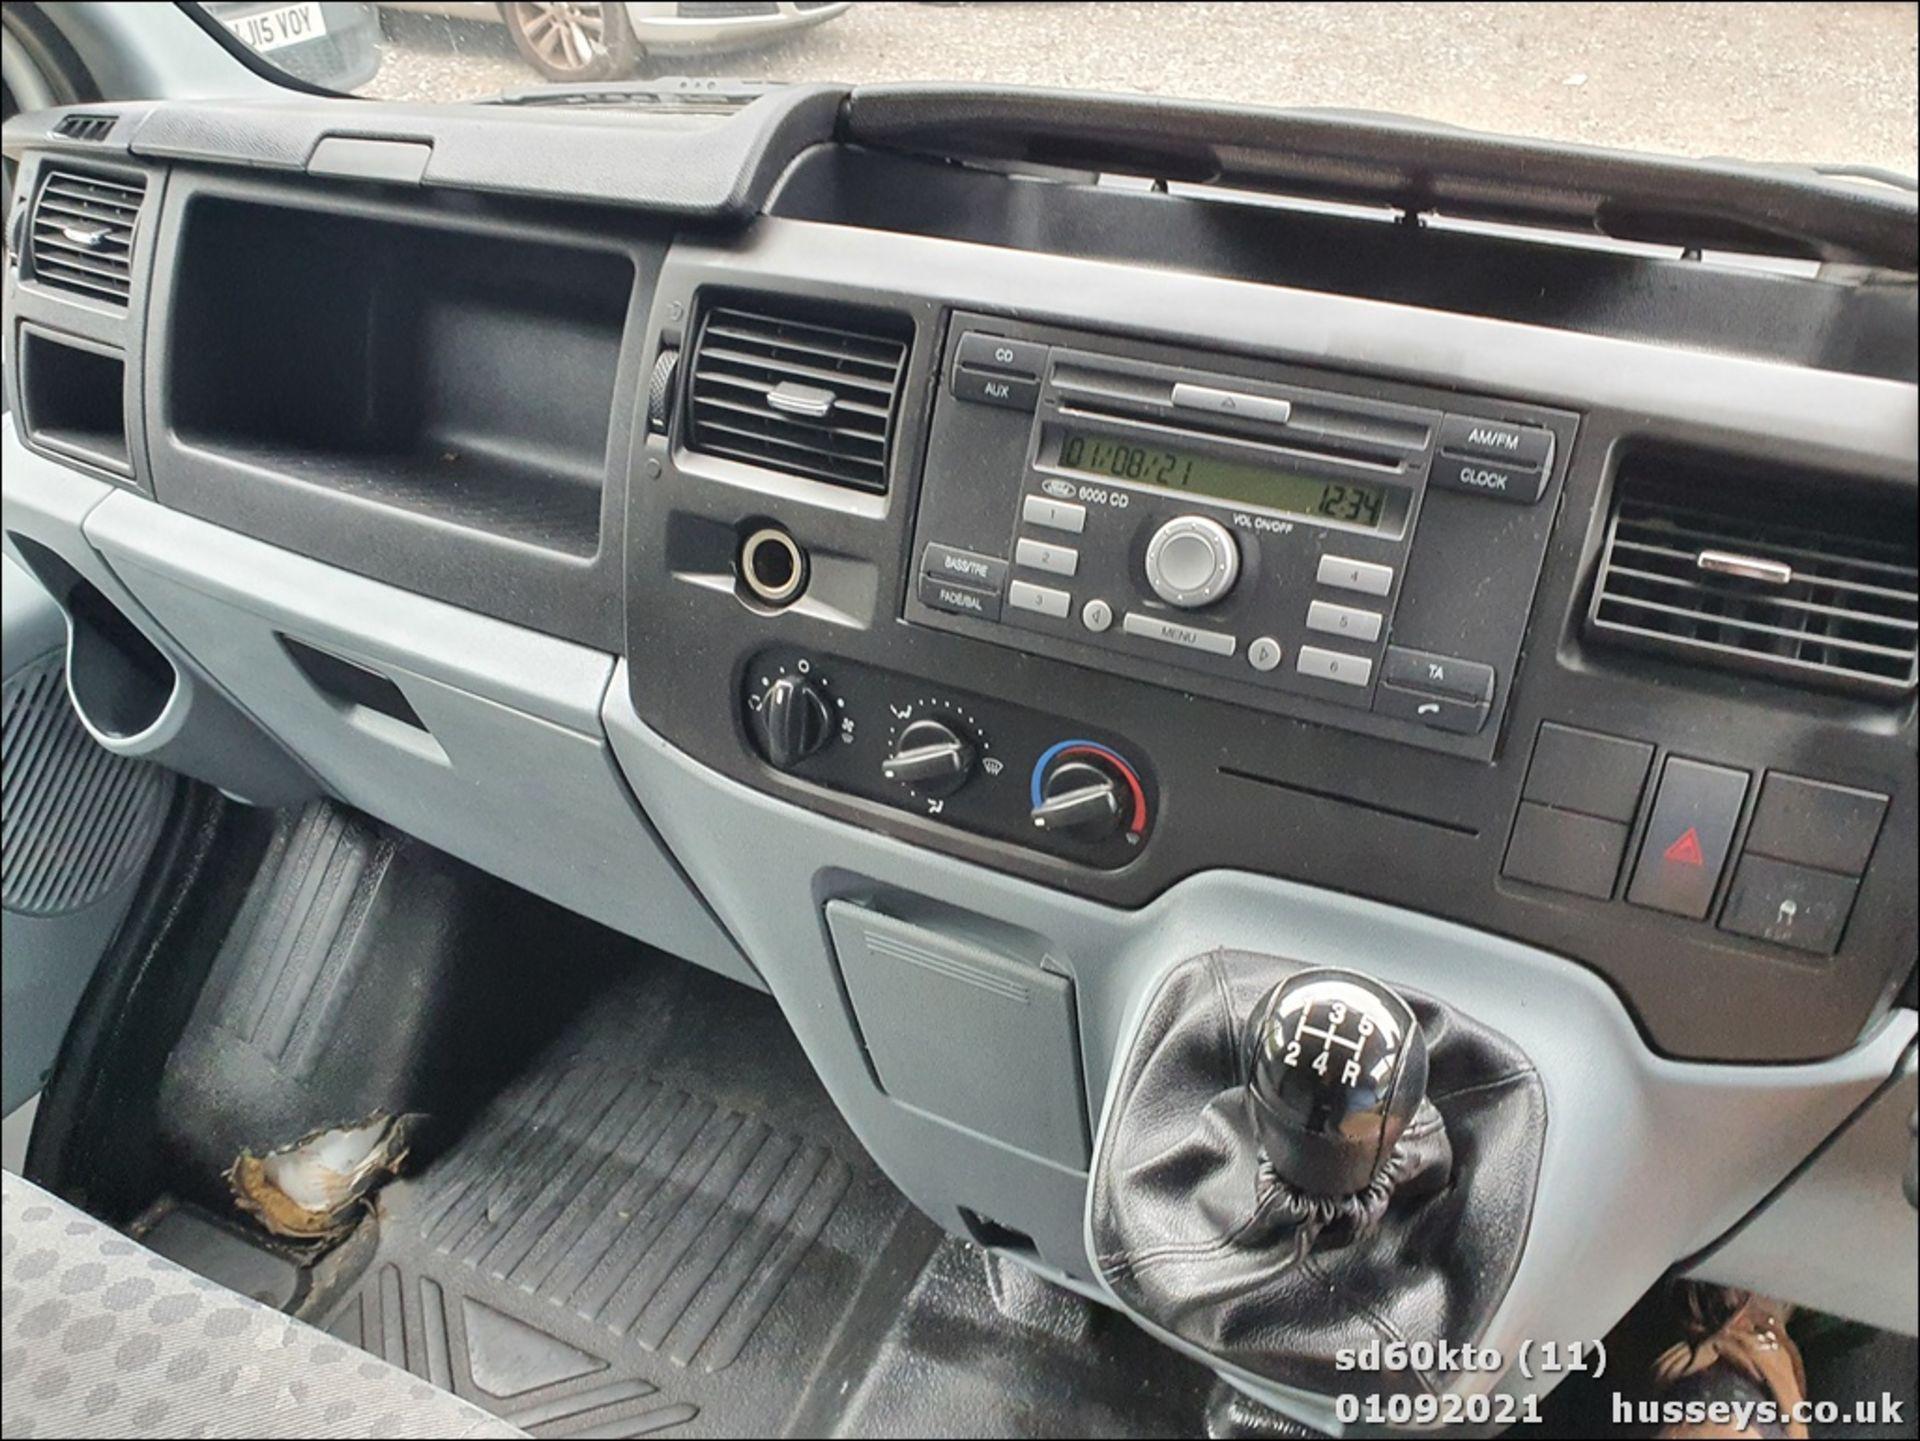 10/60 FORD TRANSIT 85 T260M FWD - 2198cc 5dr Van (White, 237k) - Image 22 of 23